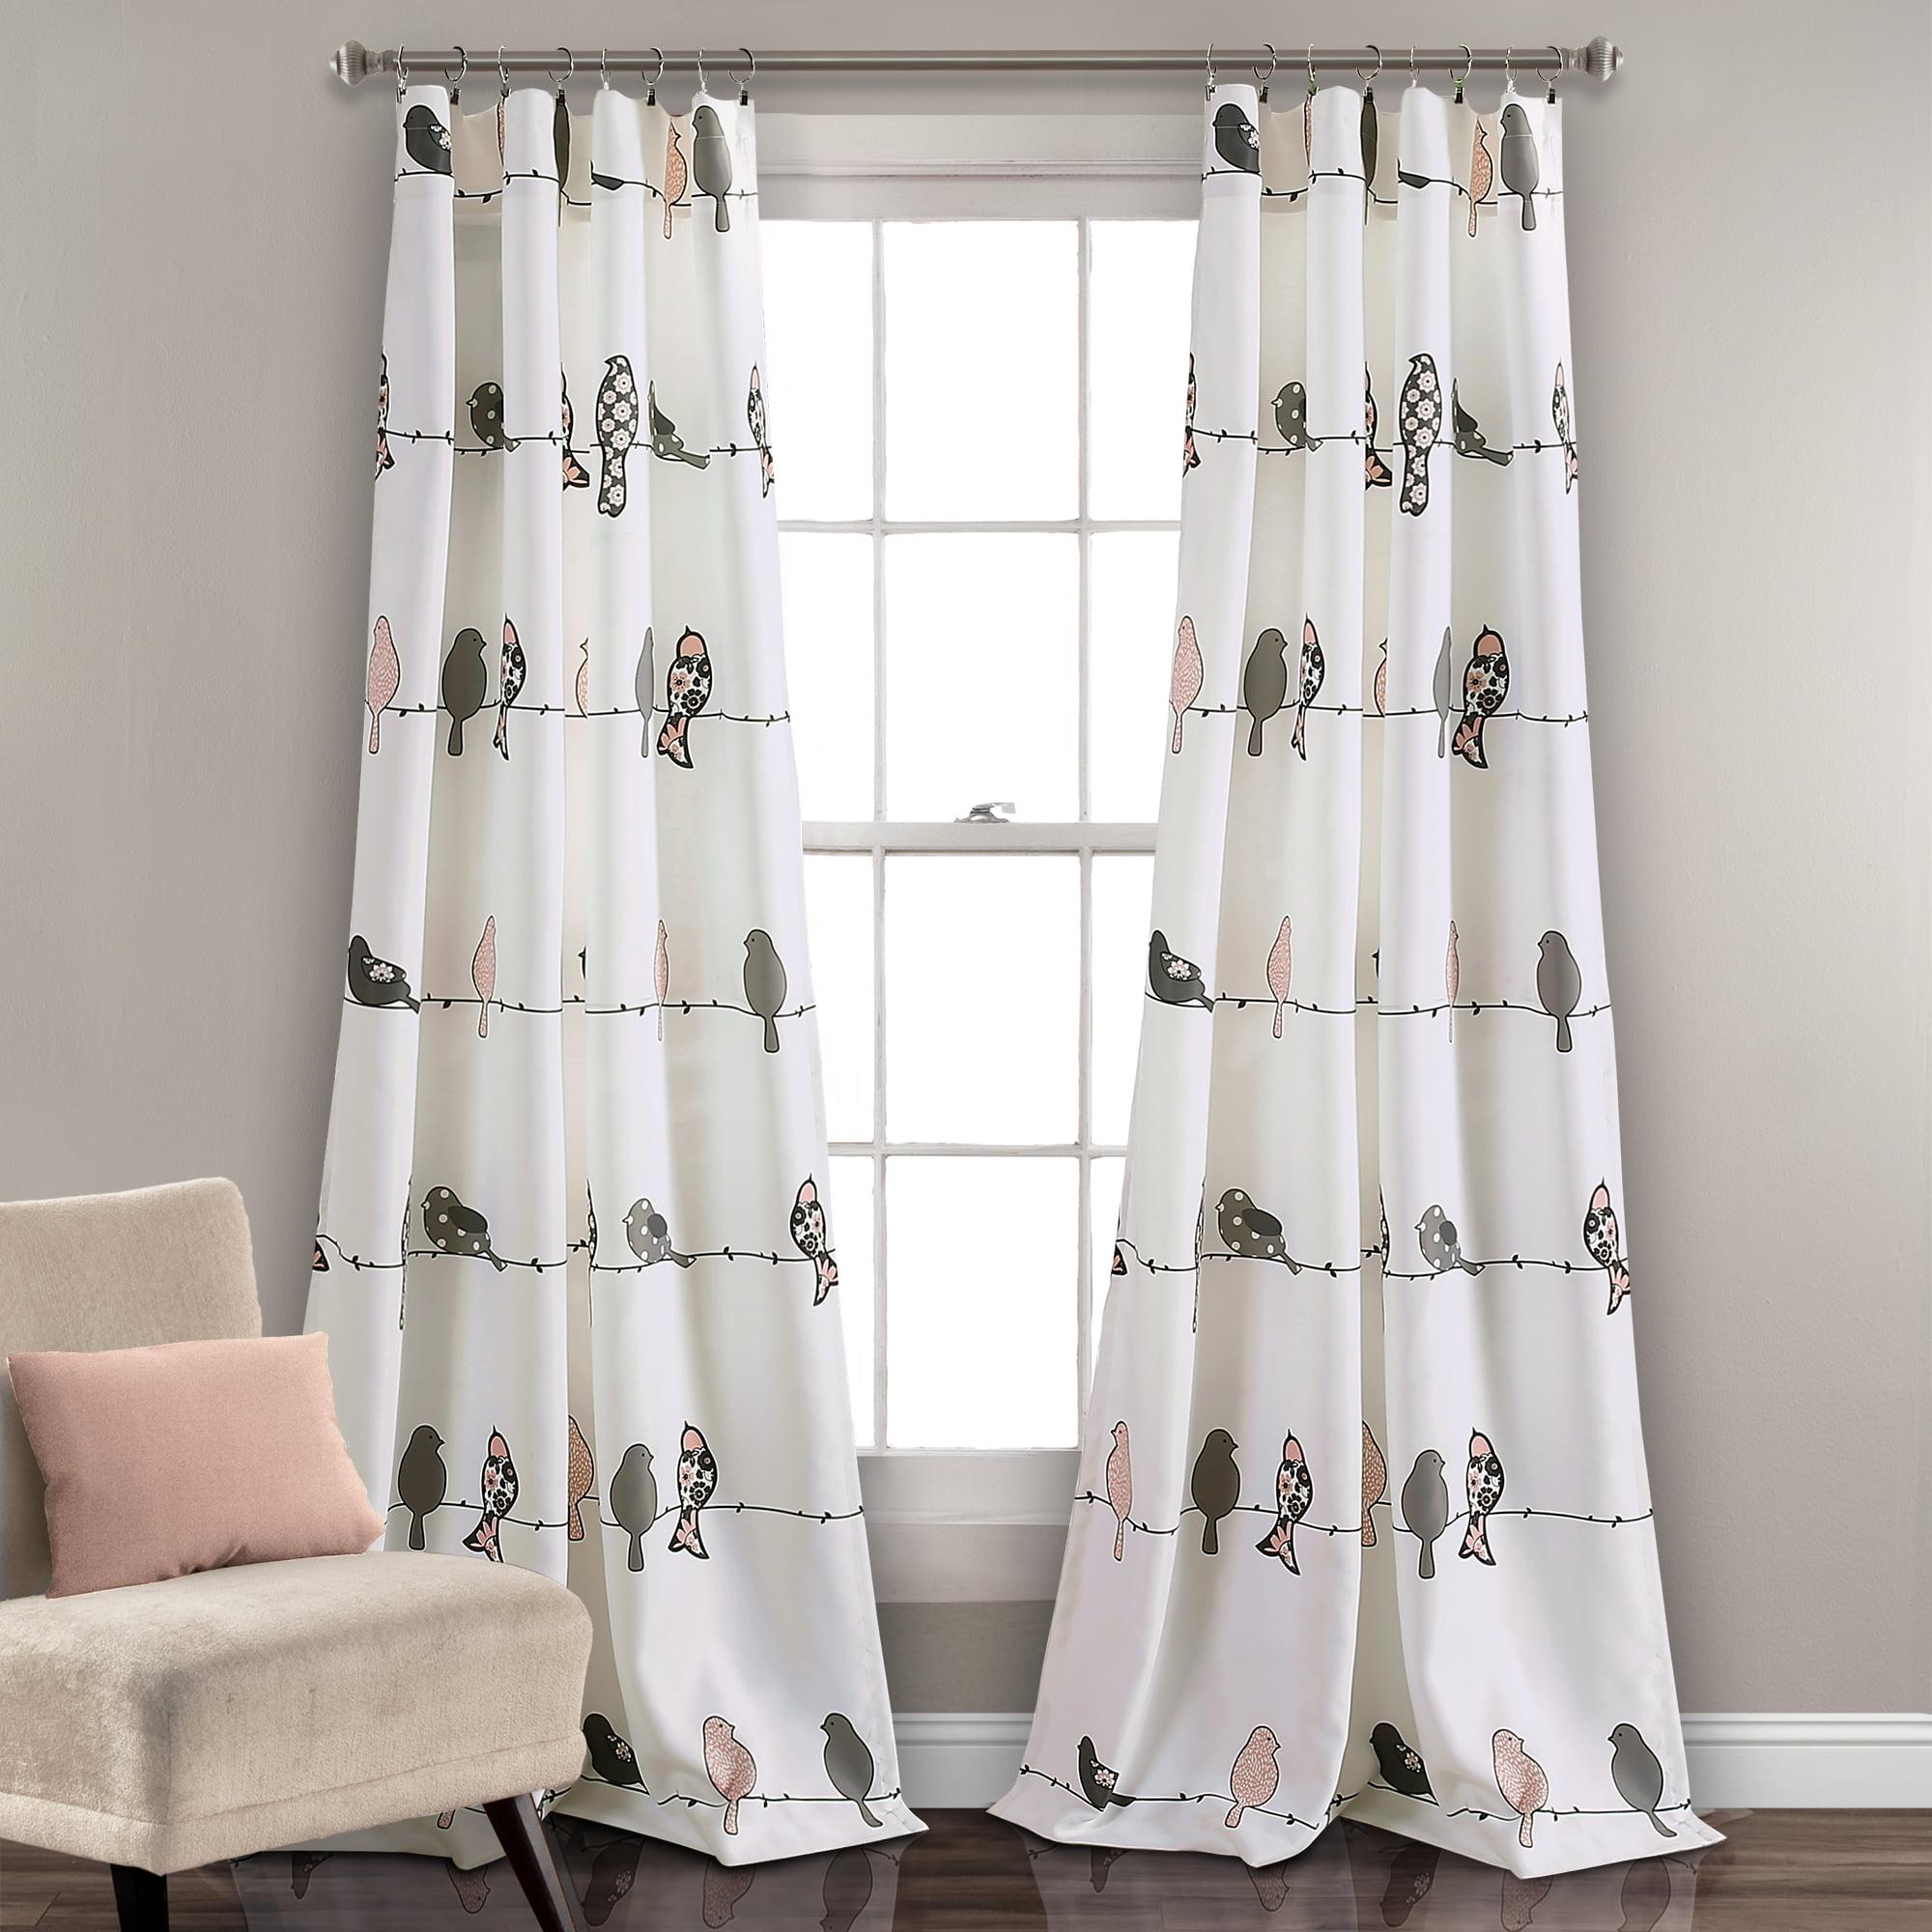 Rowley Birds Room Darkening Window Curtain Panels Blush/Gray Set 52X84+2